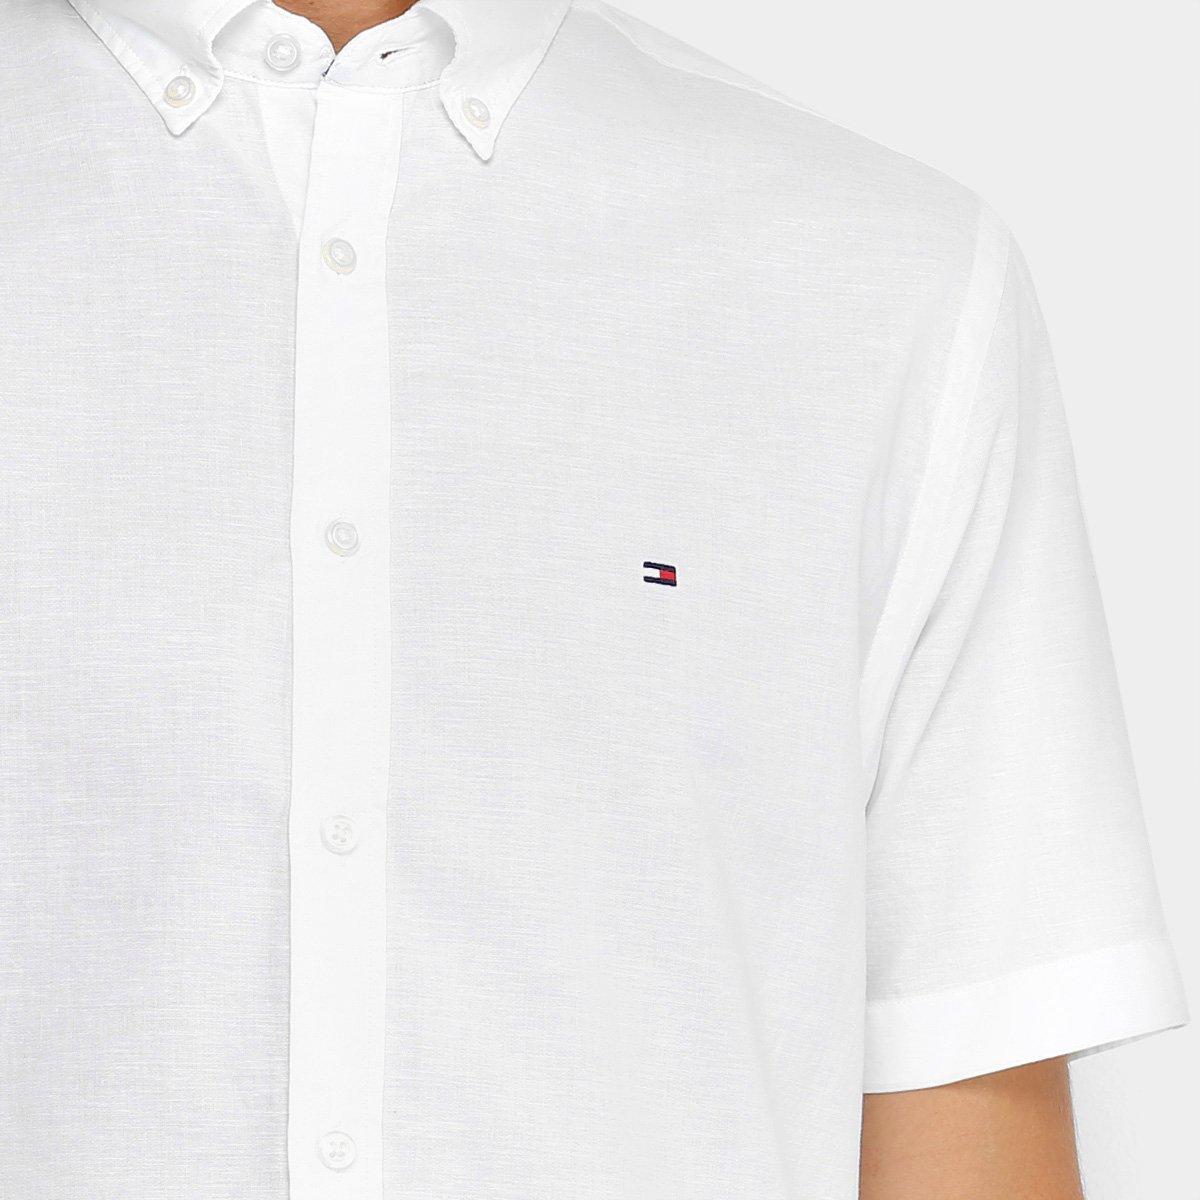 506abb0337 Camisa Manga Curta Tommy Hilfiger Fio A Fio Regular Fit Masculina ...